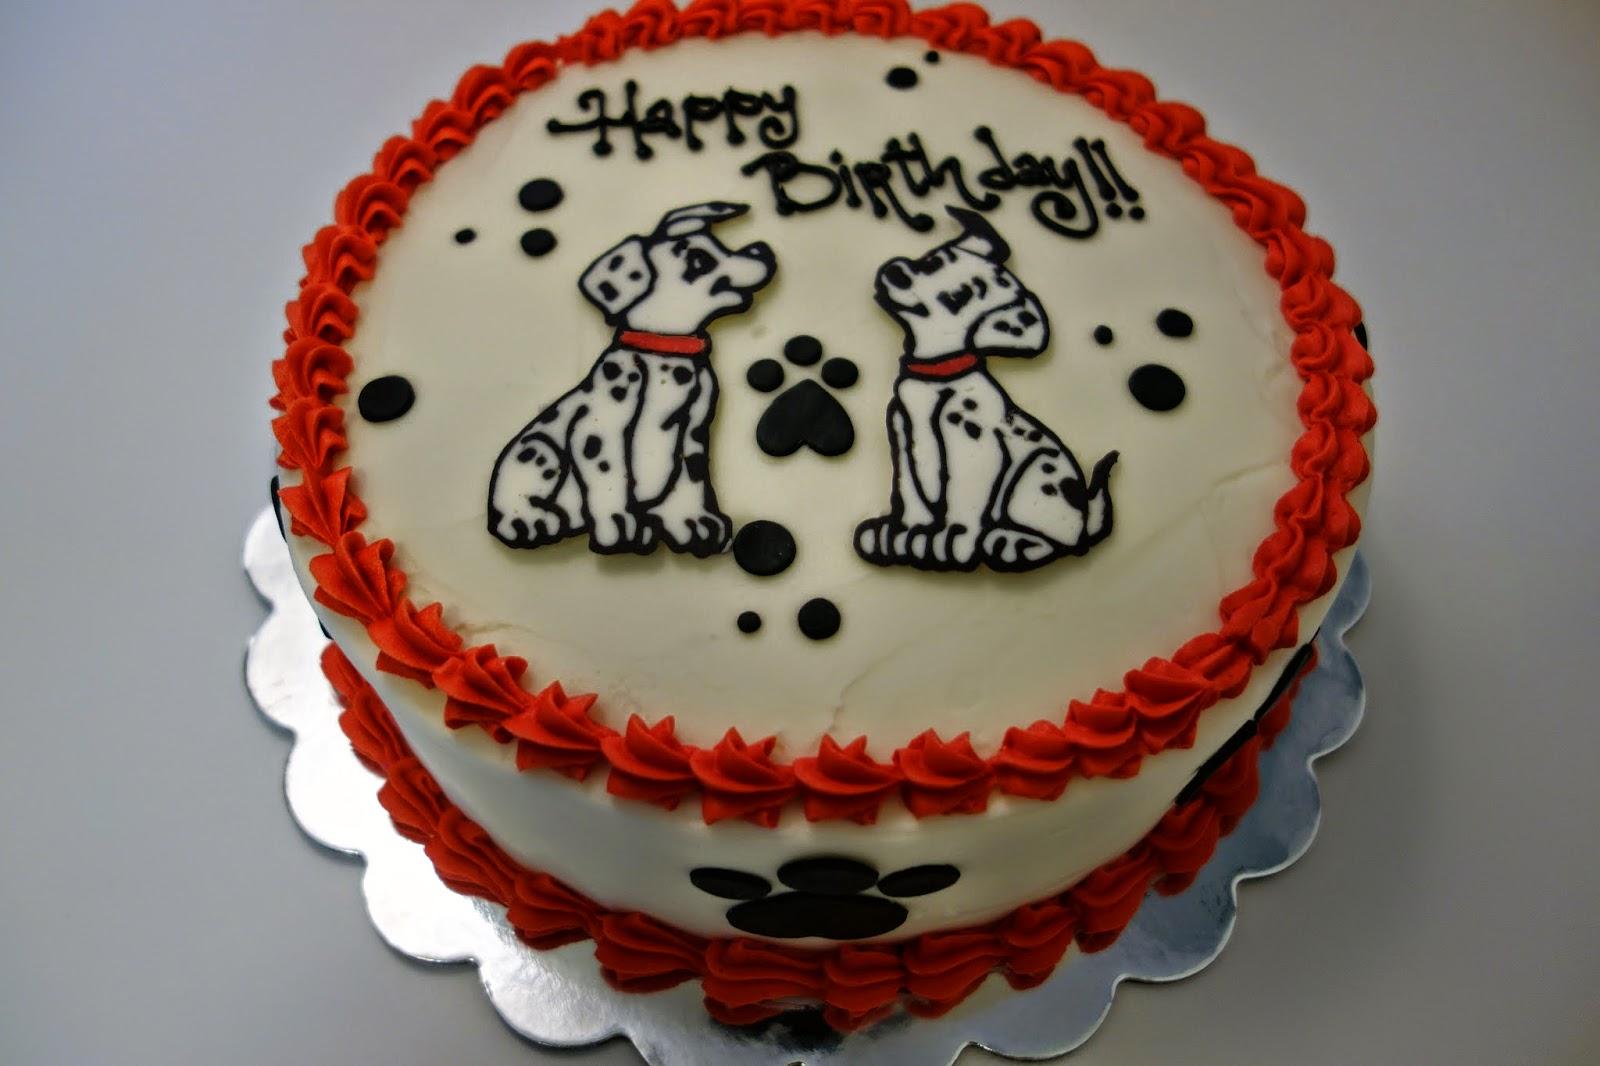 101 Dalmatians Birthday Cake Candy Coated